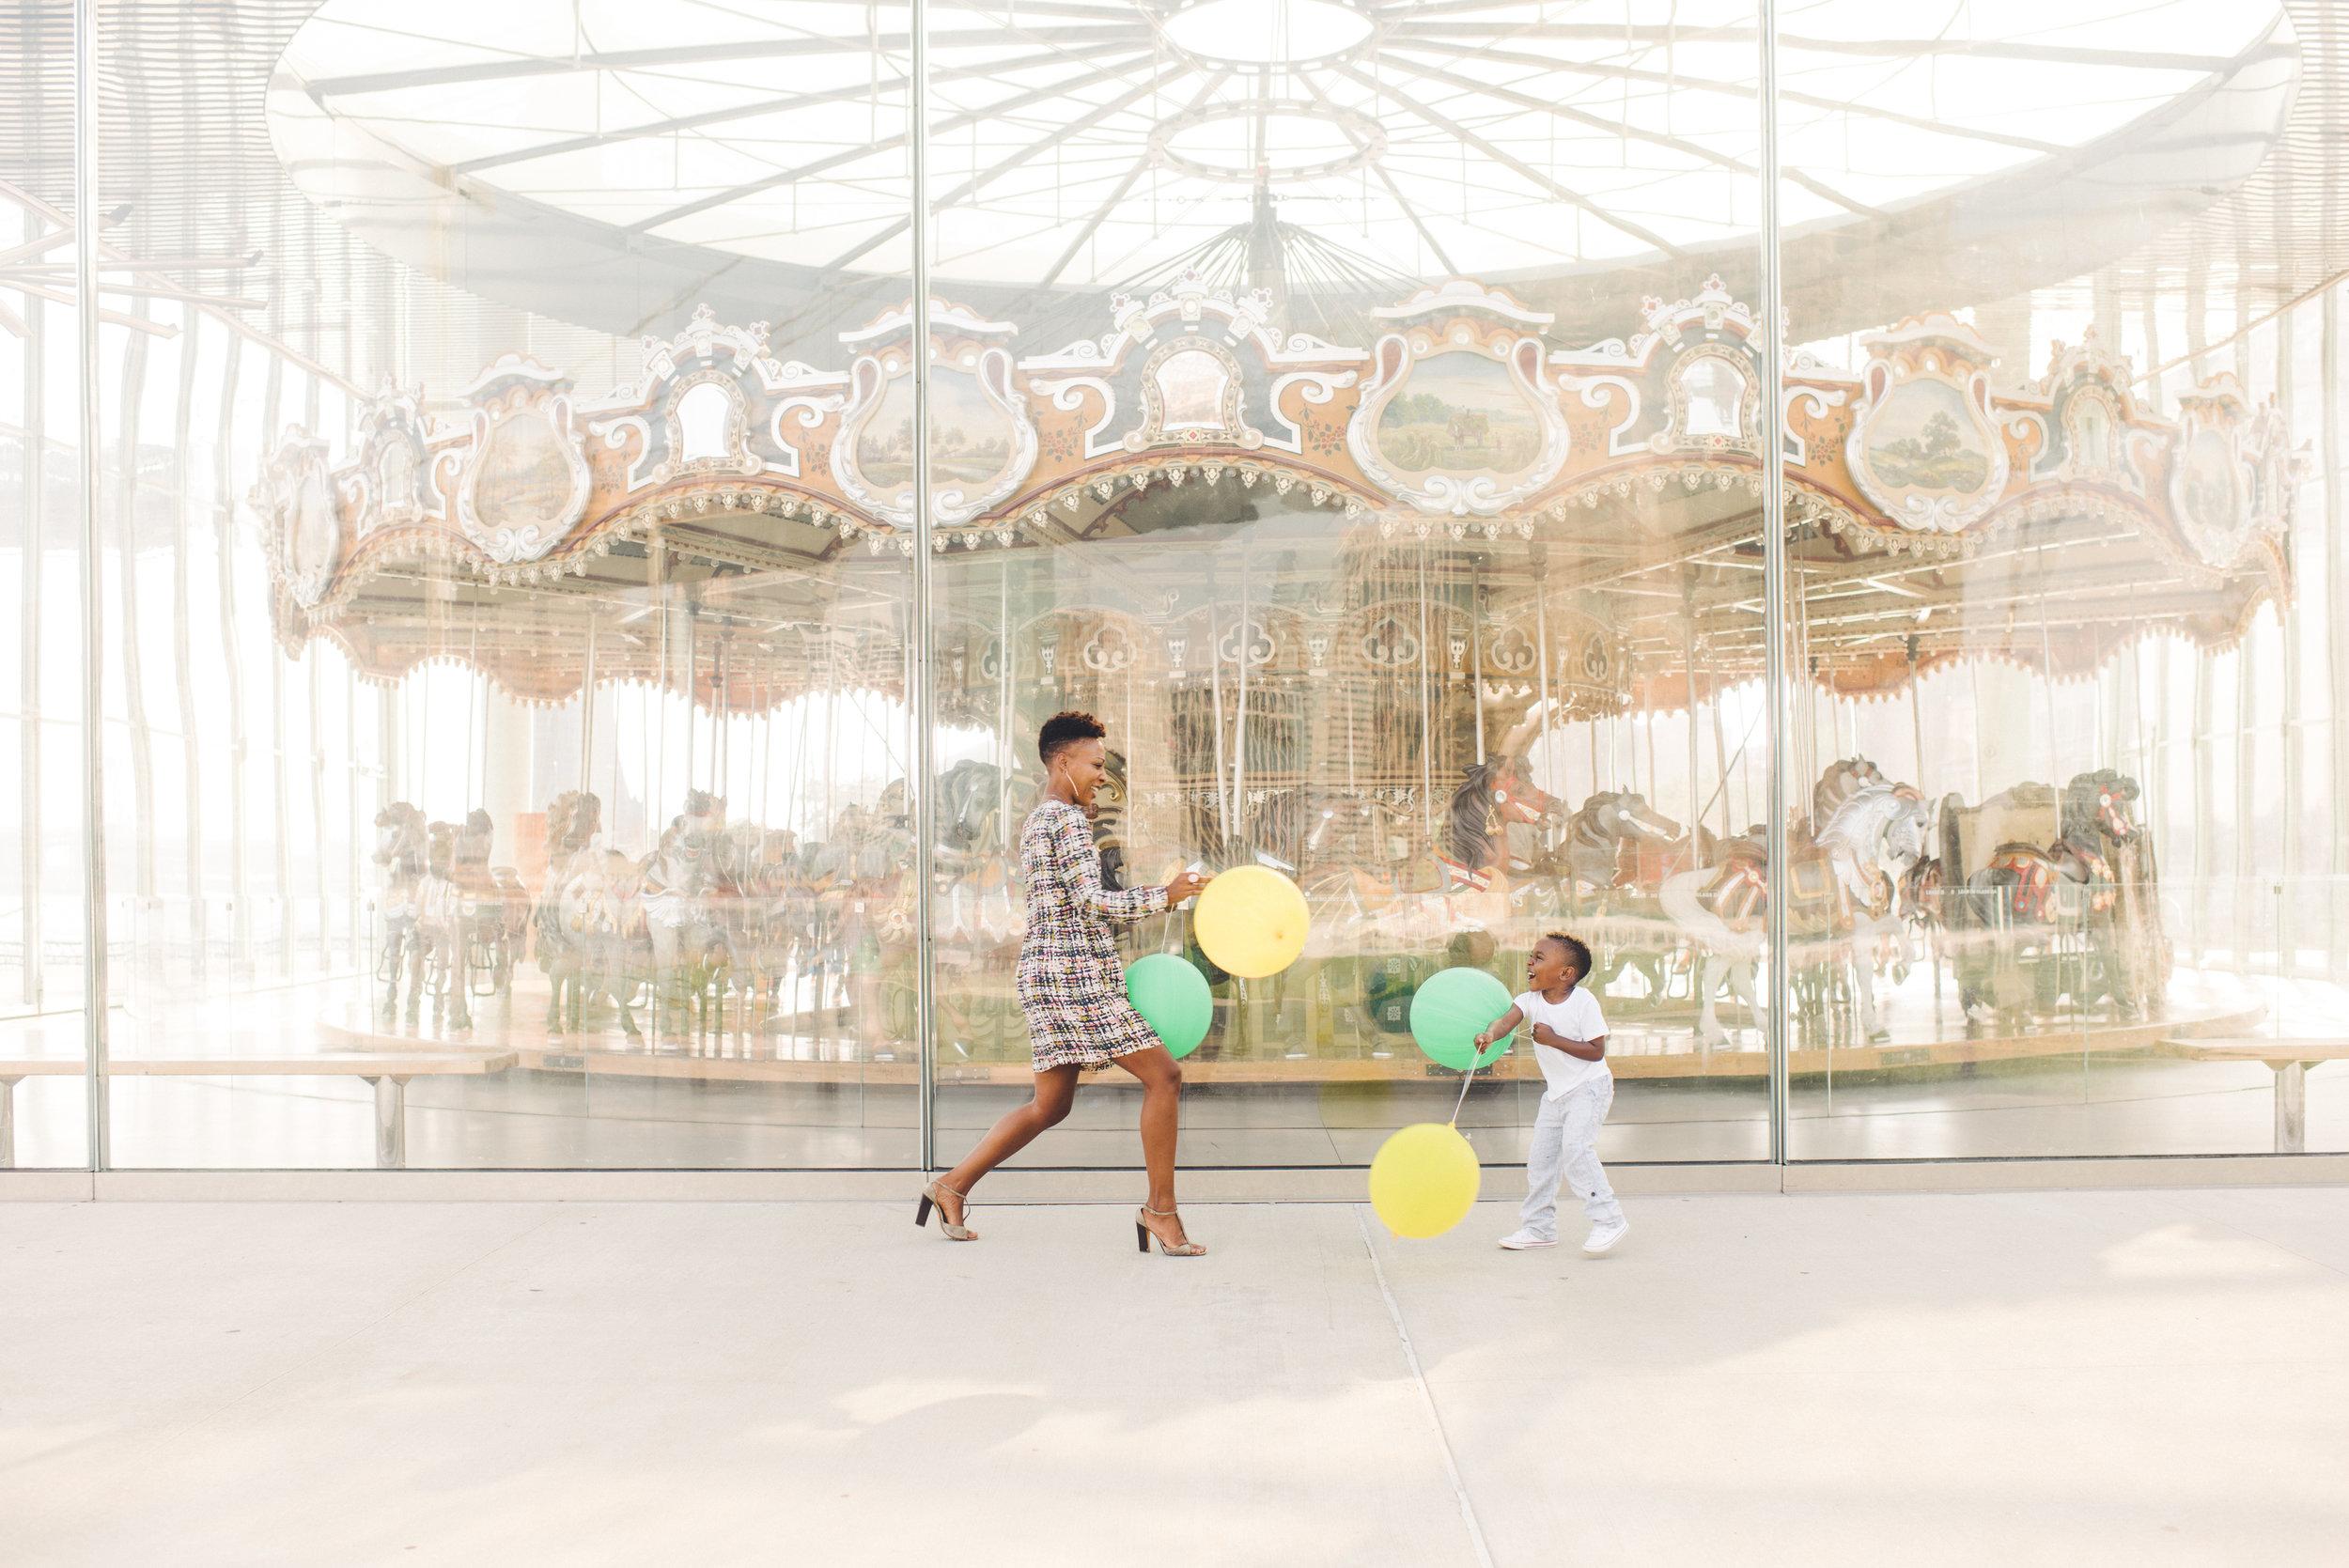 TAJUANNA GREENE - JANES CAROUSEL - TWOTWENTY by CHI-CHI AGBIM-1.jpg